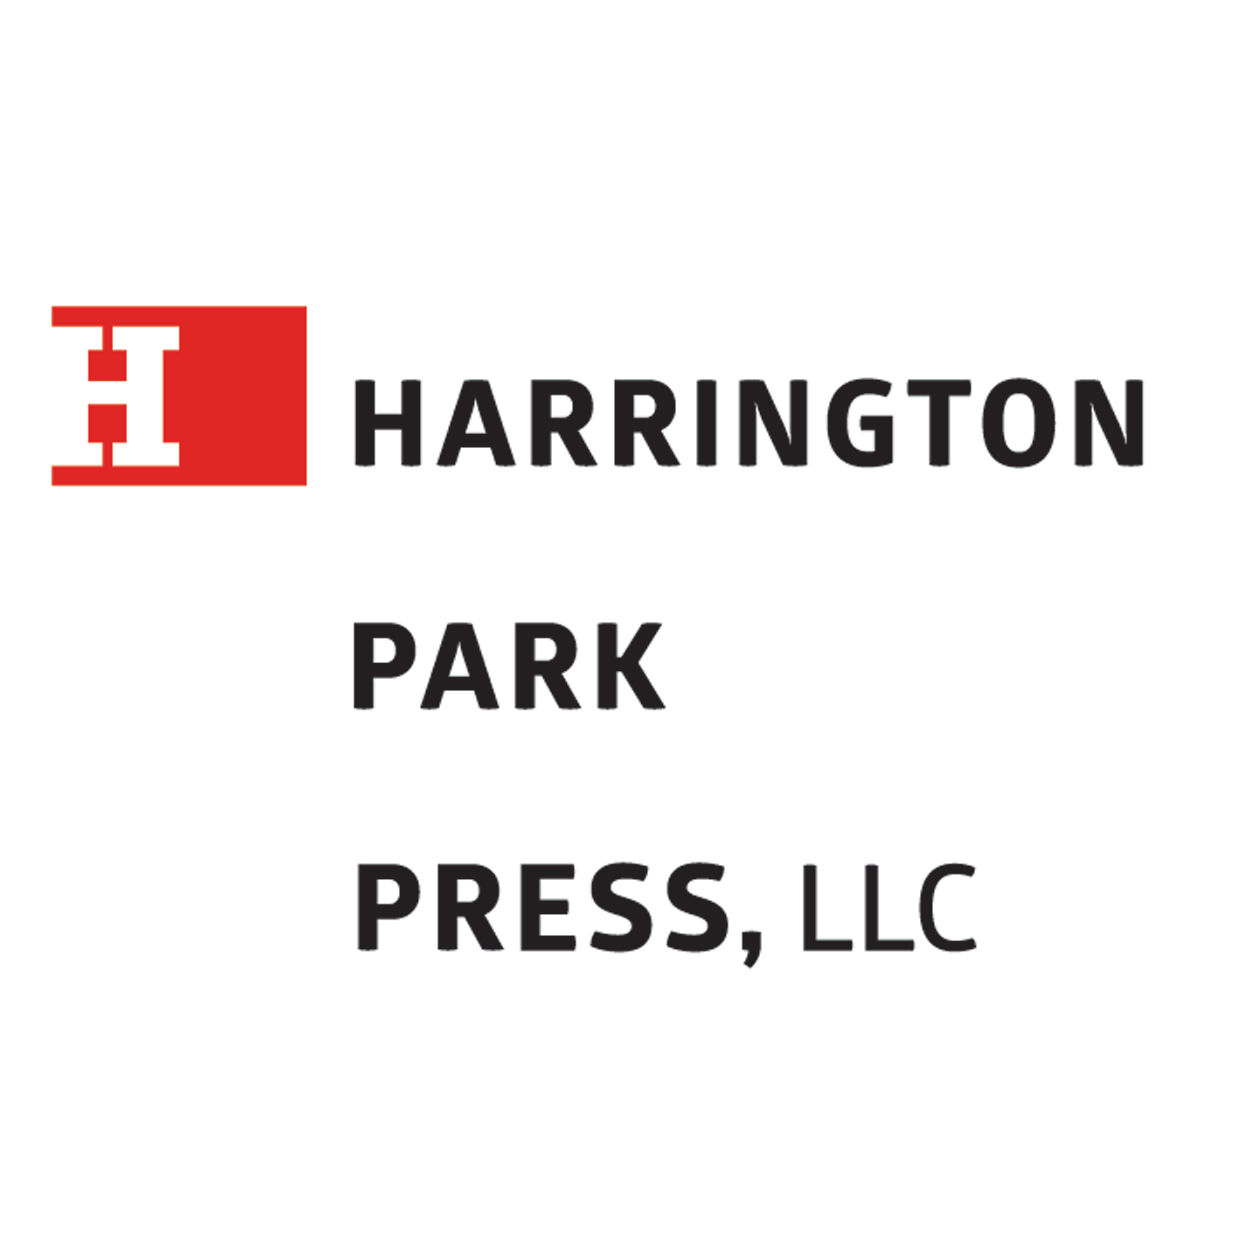 Harrington Park Press